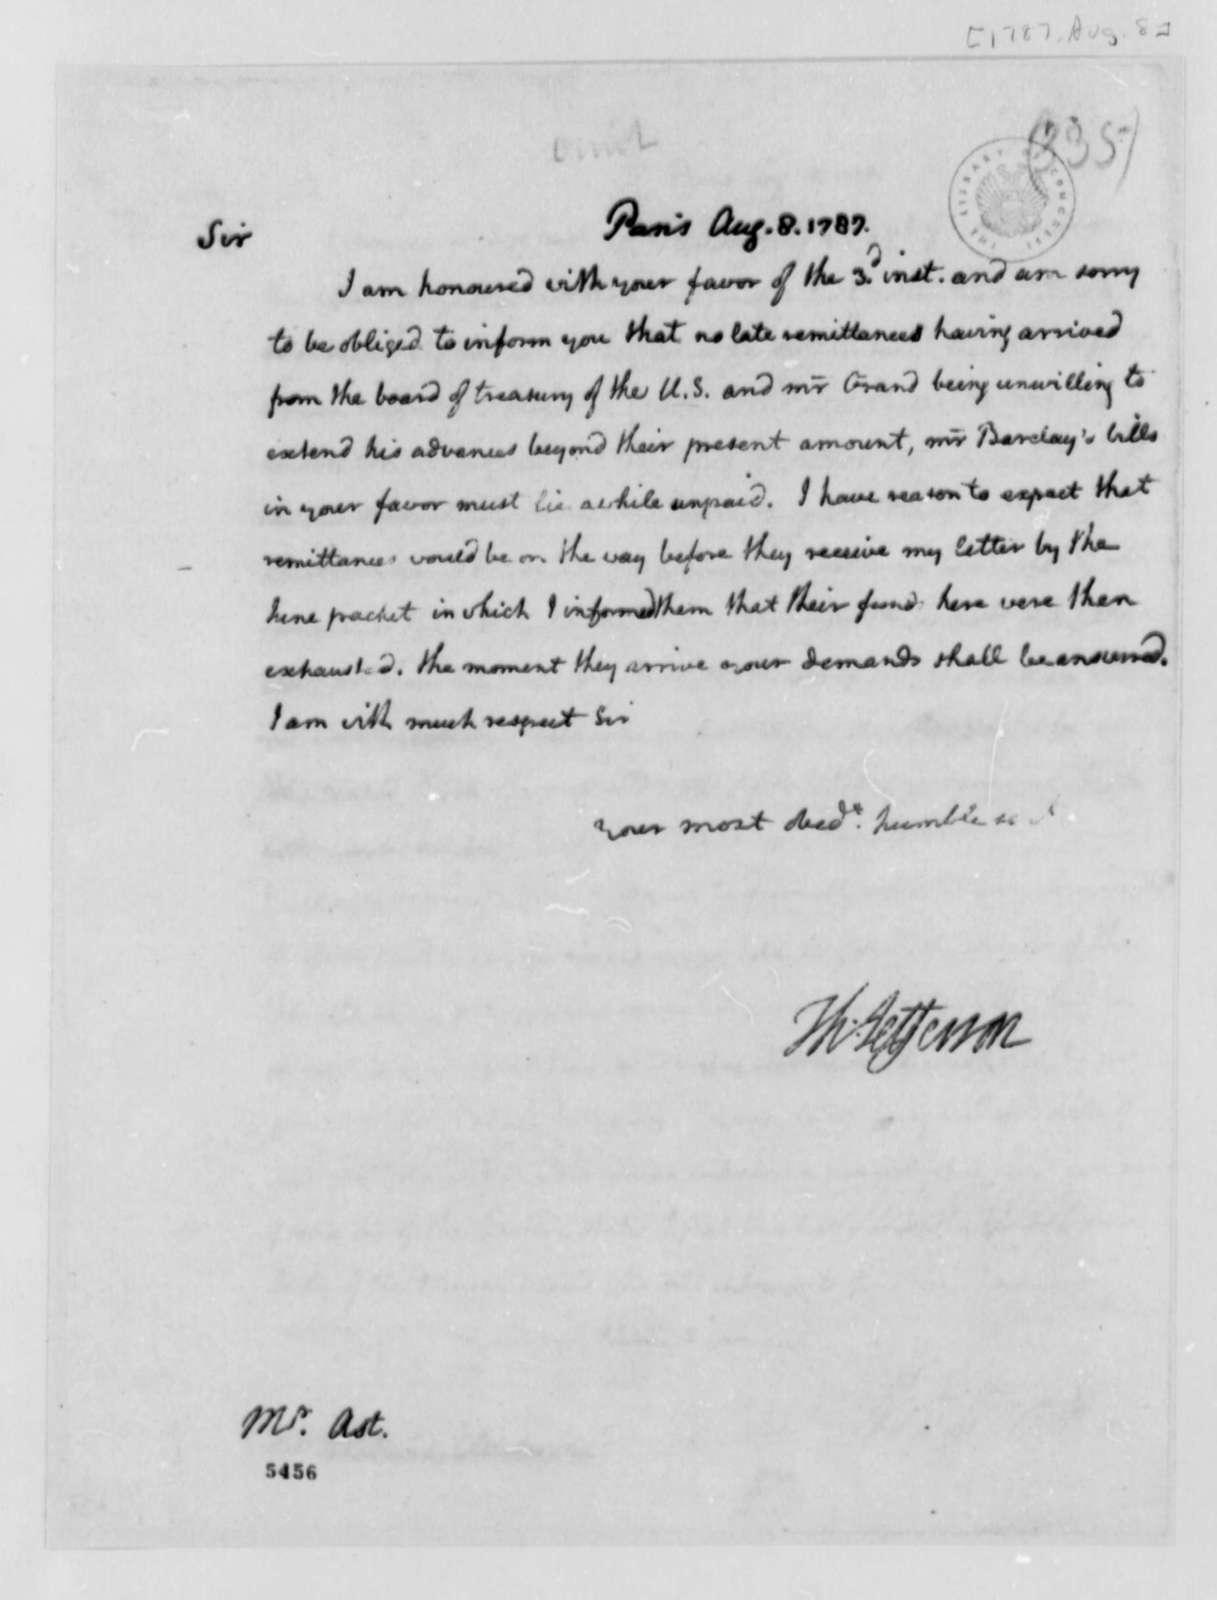 Thomas Jefferson to Frederick William Ast, August 8, 1787